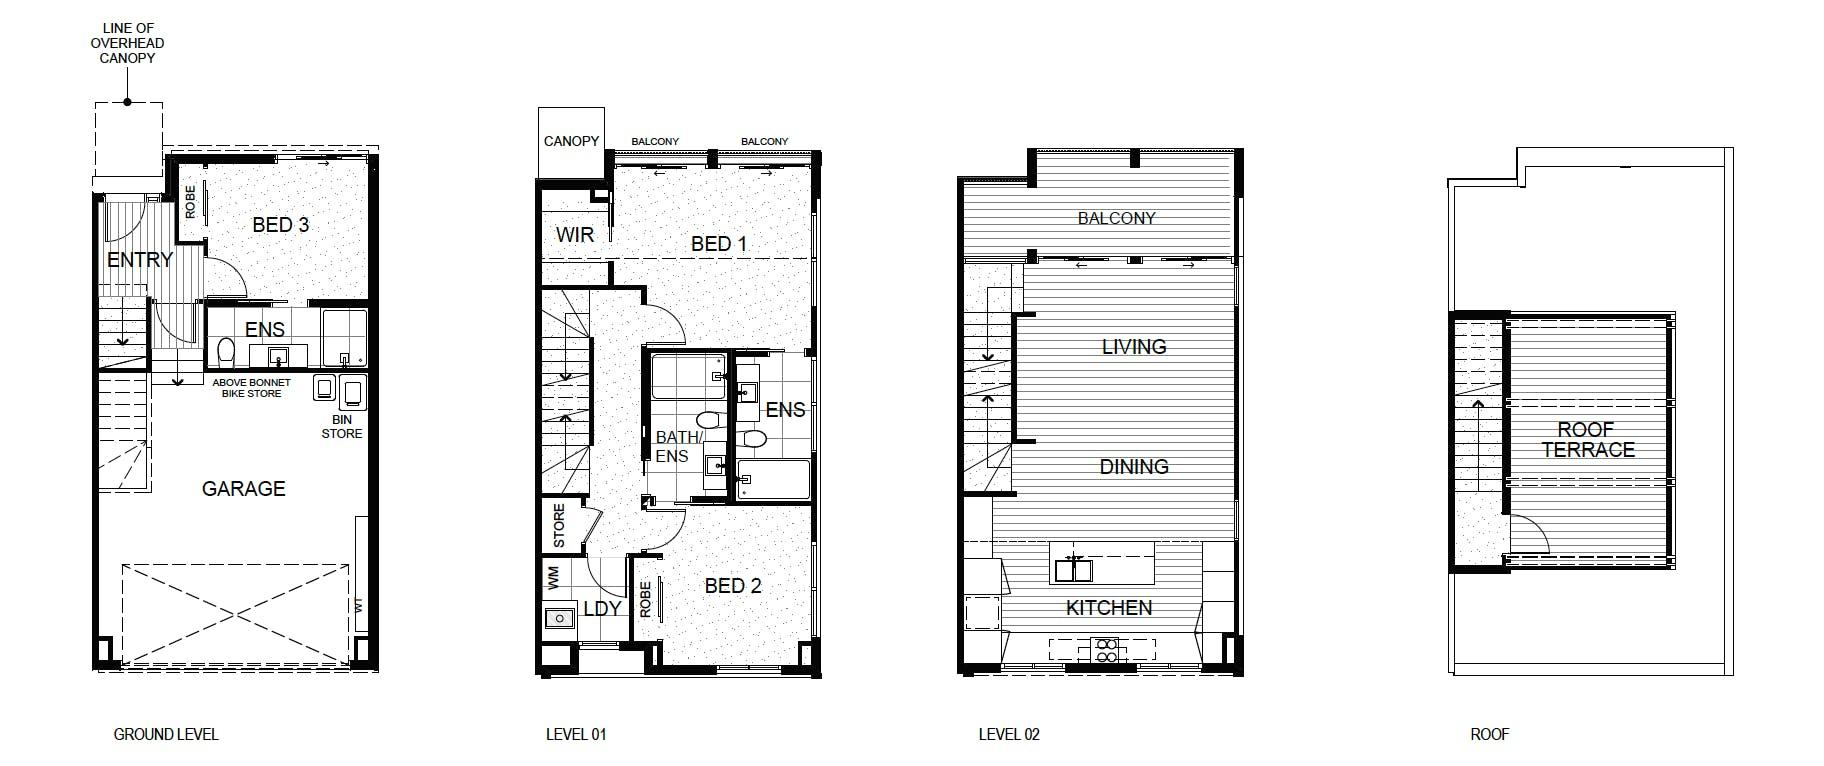 3 Bedroom, 3 Bathroom, 2 Carpark, Rooftop Terrace